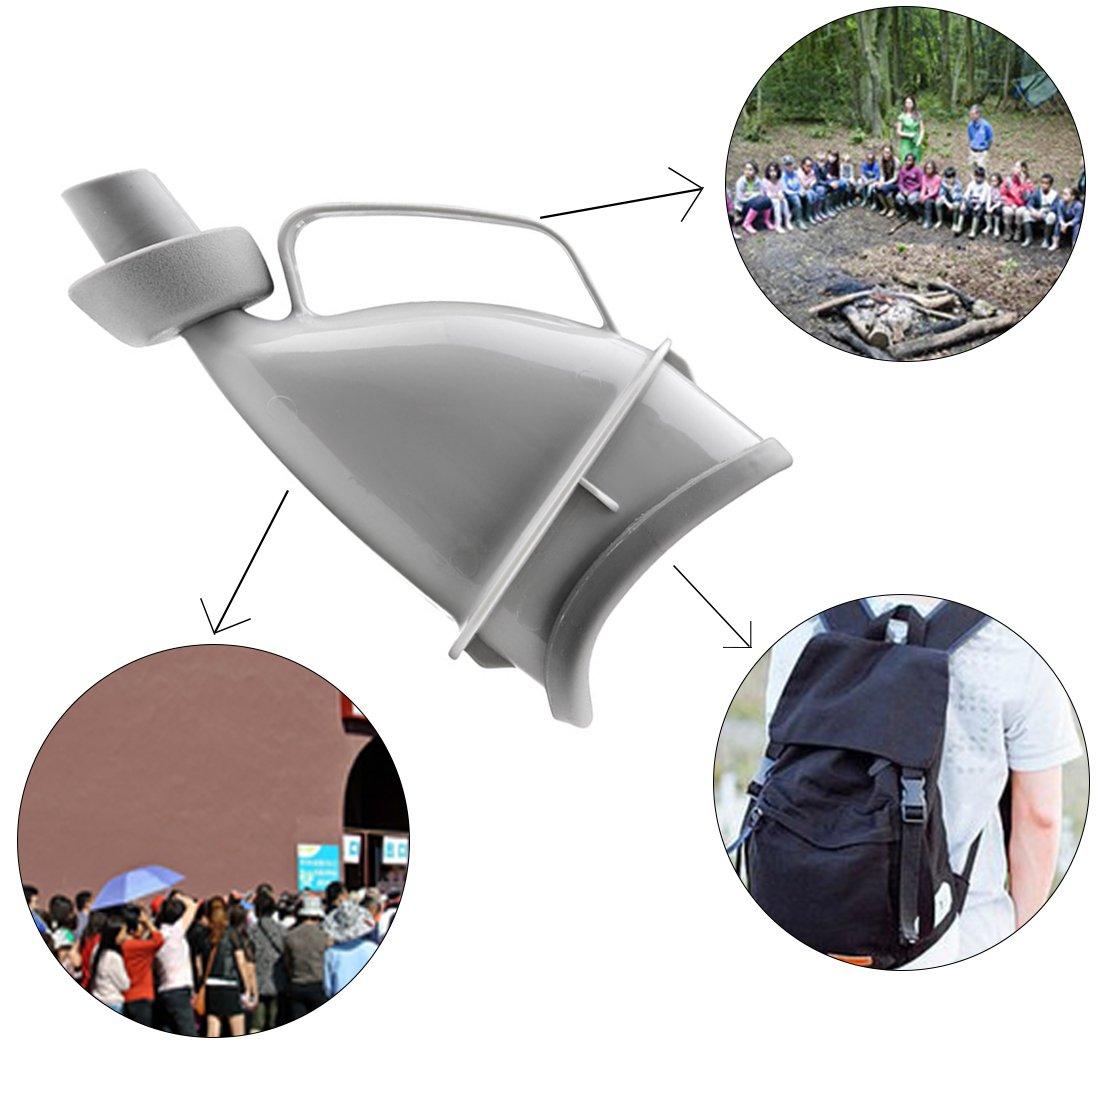 Emergencia al Aire Libre Se/ñora Orinal p/úrpura Gel de s/ílice m/édico Plegable Embarazadas Mujeres Embudo Orinal Reutilizable Viaje Camping Dispositivo de orina